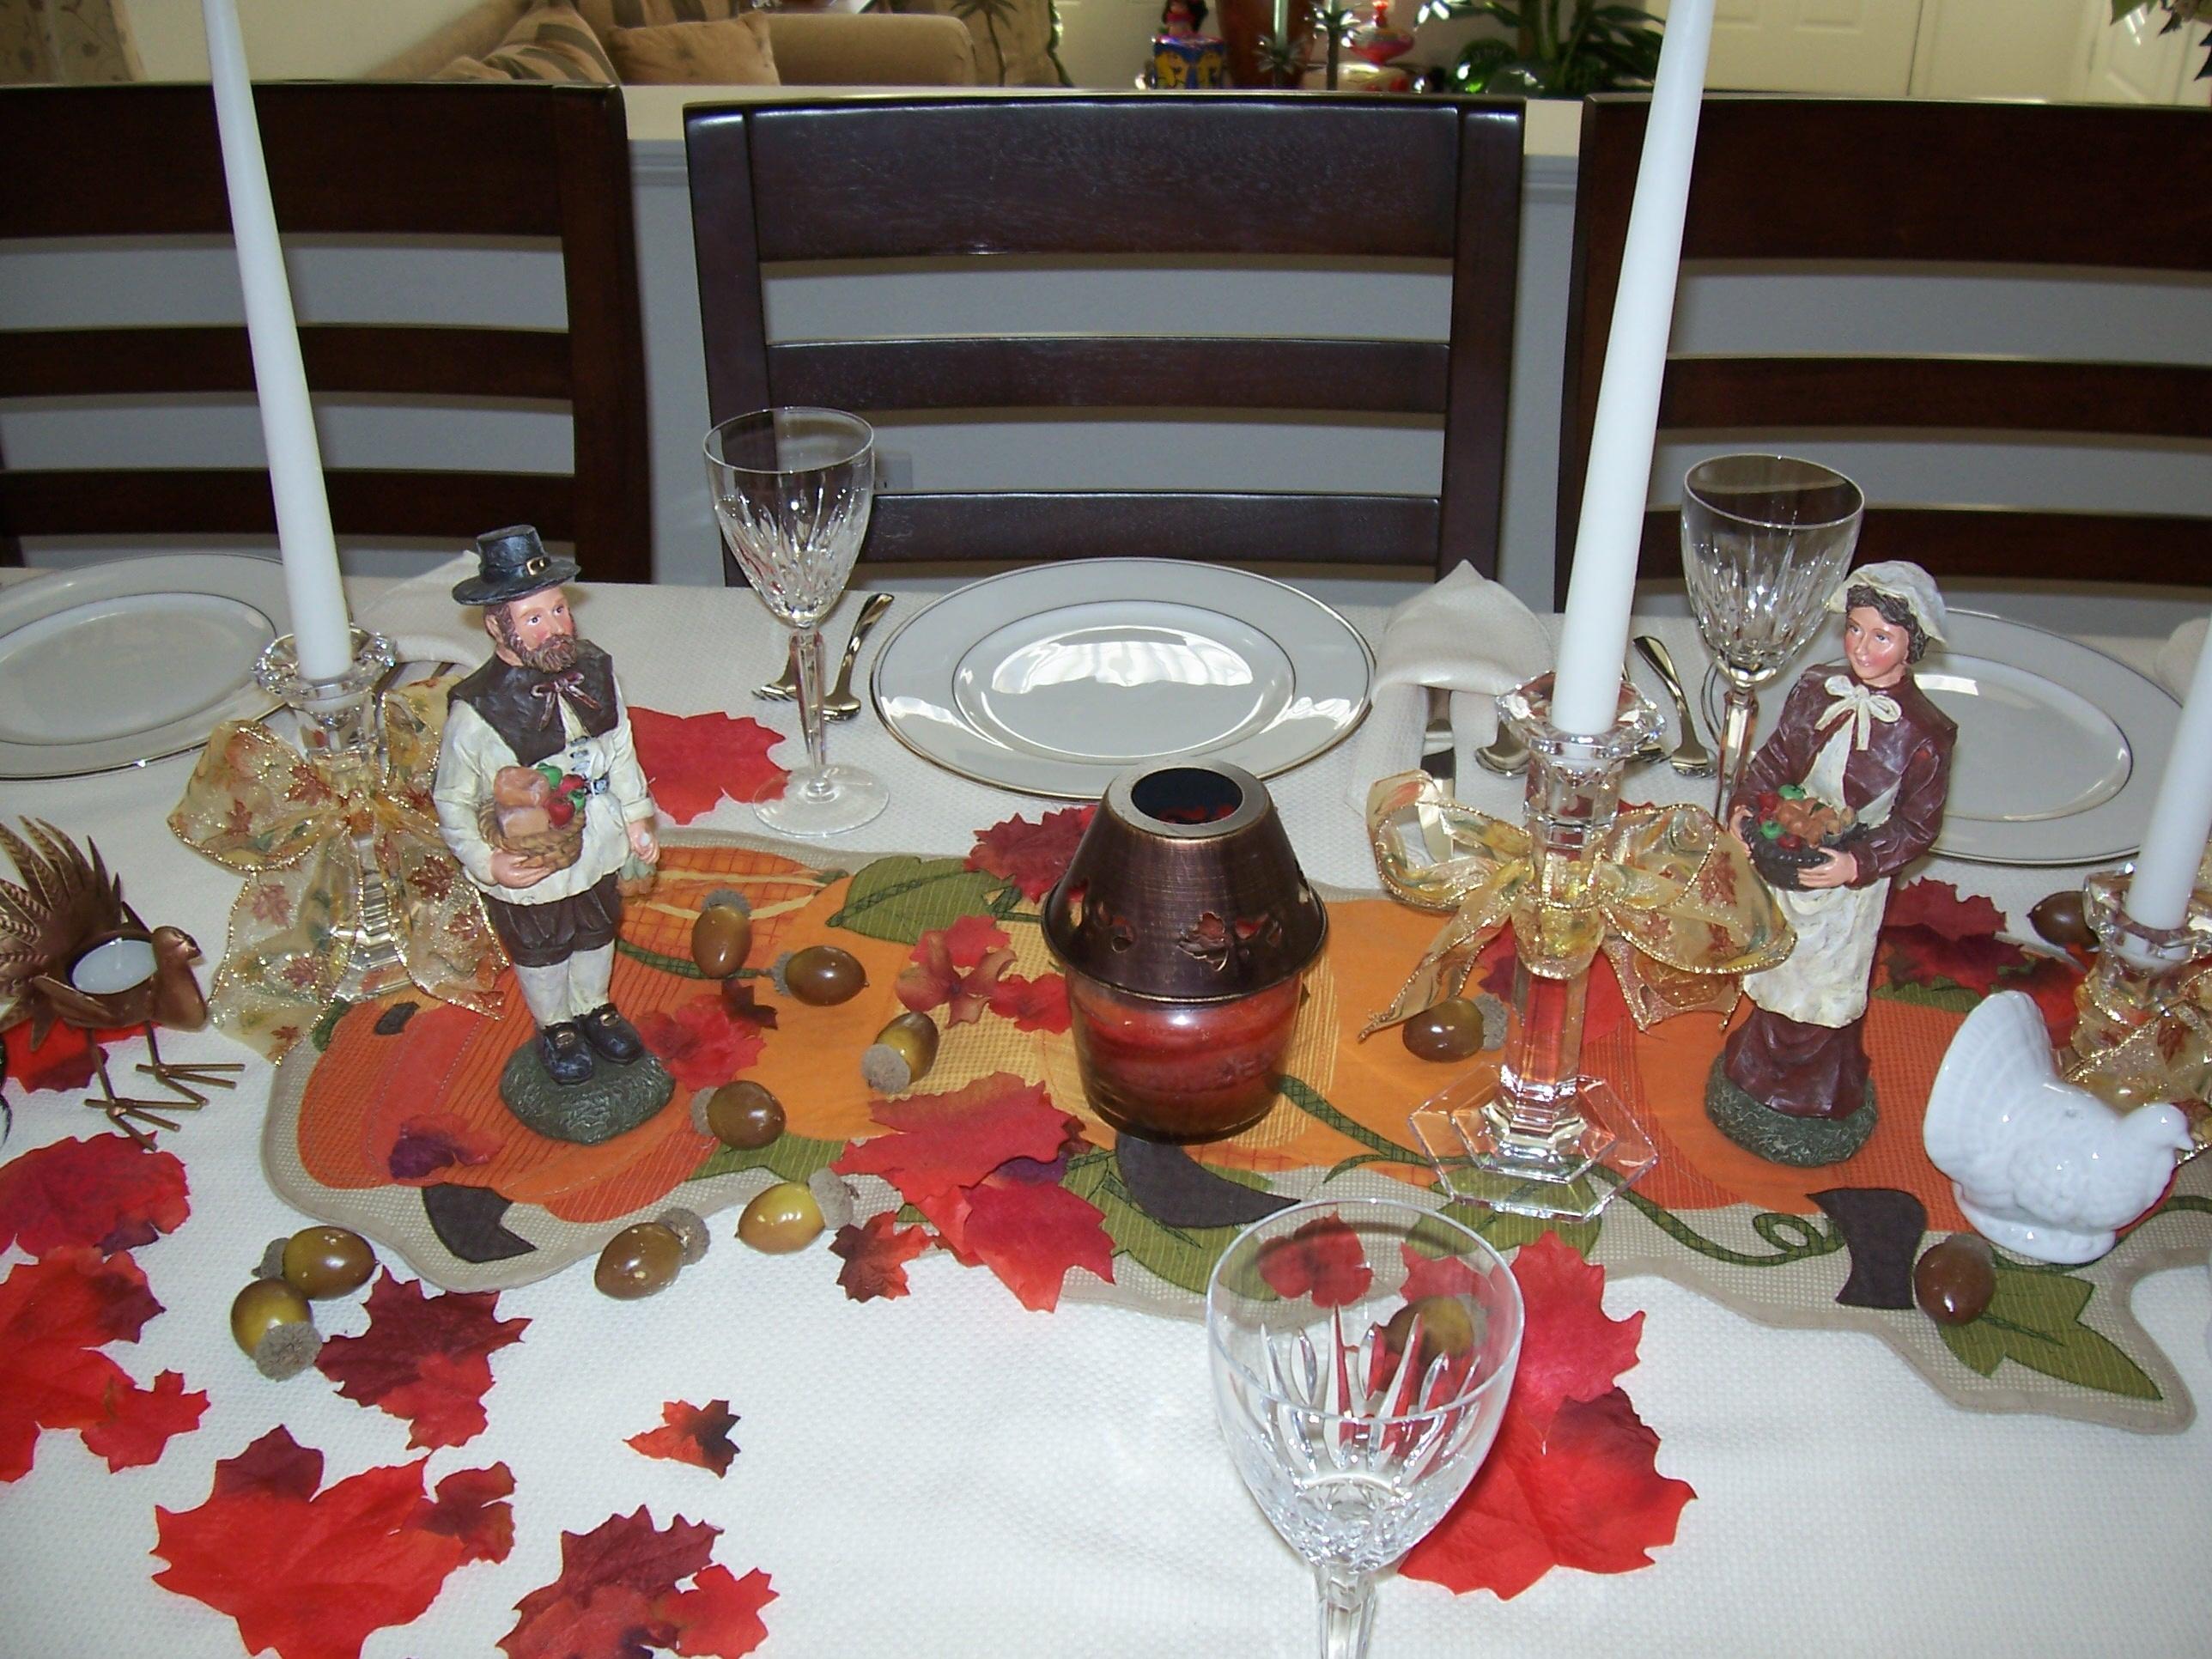 Weddings events « tasty little morsels